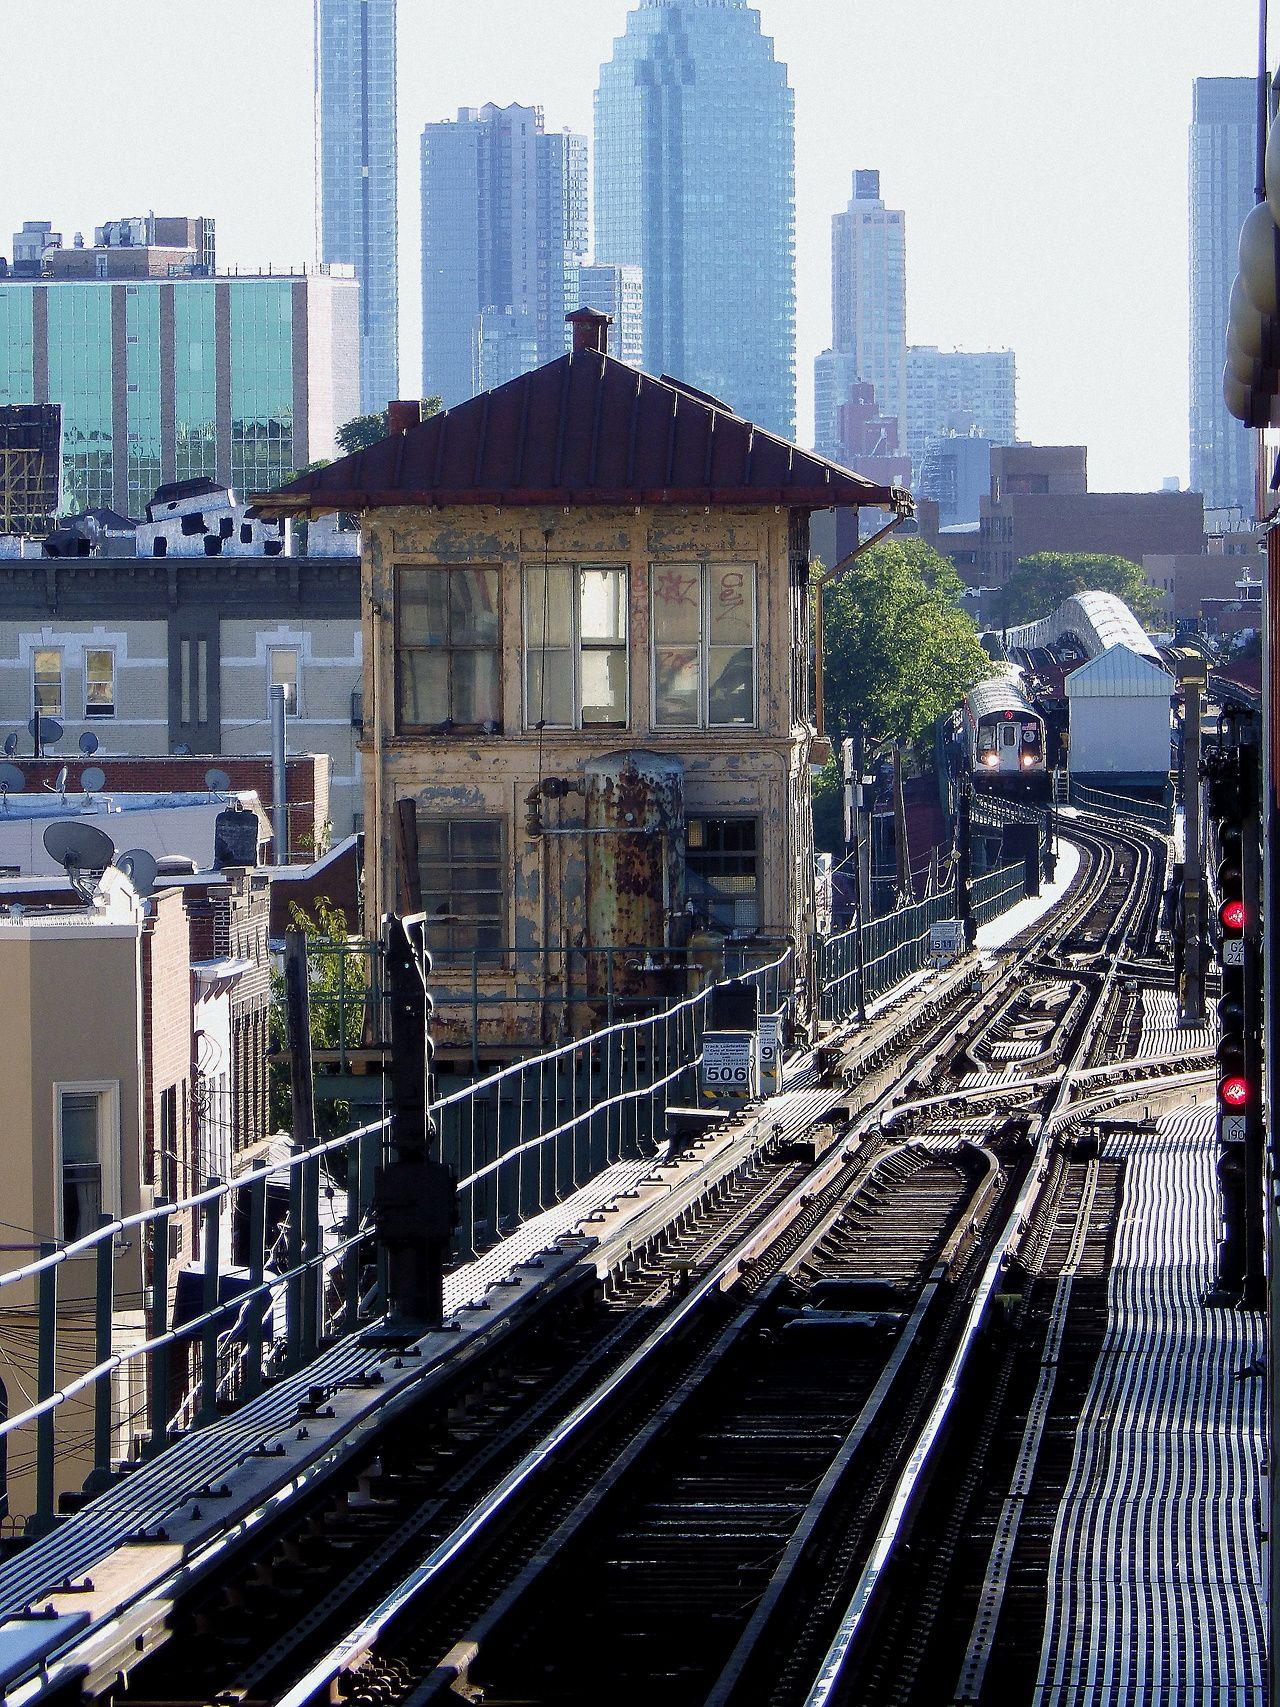 Looking Down The Tracks Of The Astoria Line Nytransitmuseum New York Subway Ny Subway Model Train Scenery